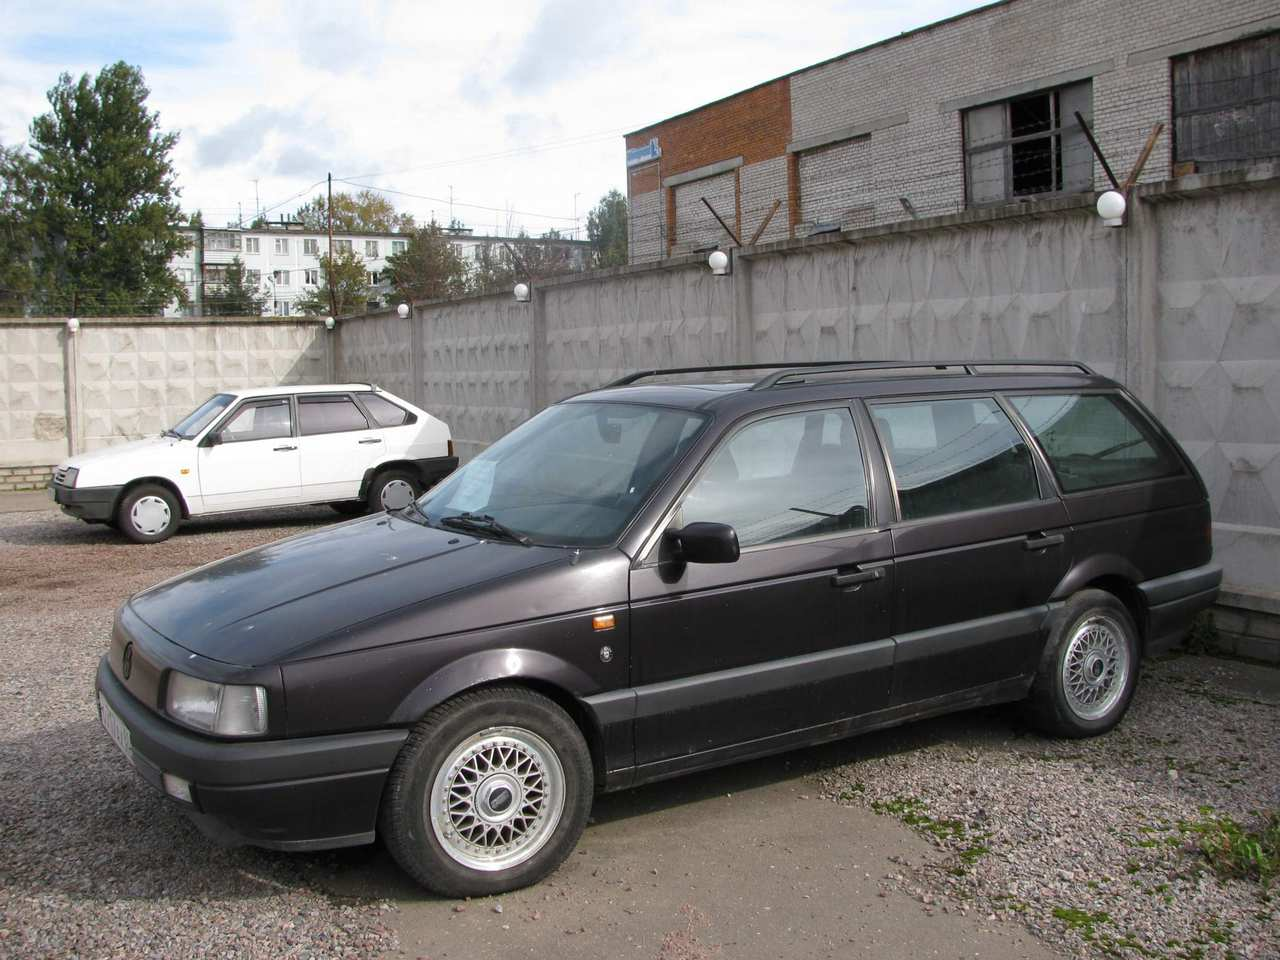 used 1992 volkswagen passat photos 2000cc gasoline ff manual for sale. Black Bedroom Furniture Sets. Home Design Ideas